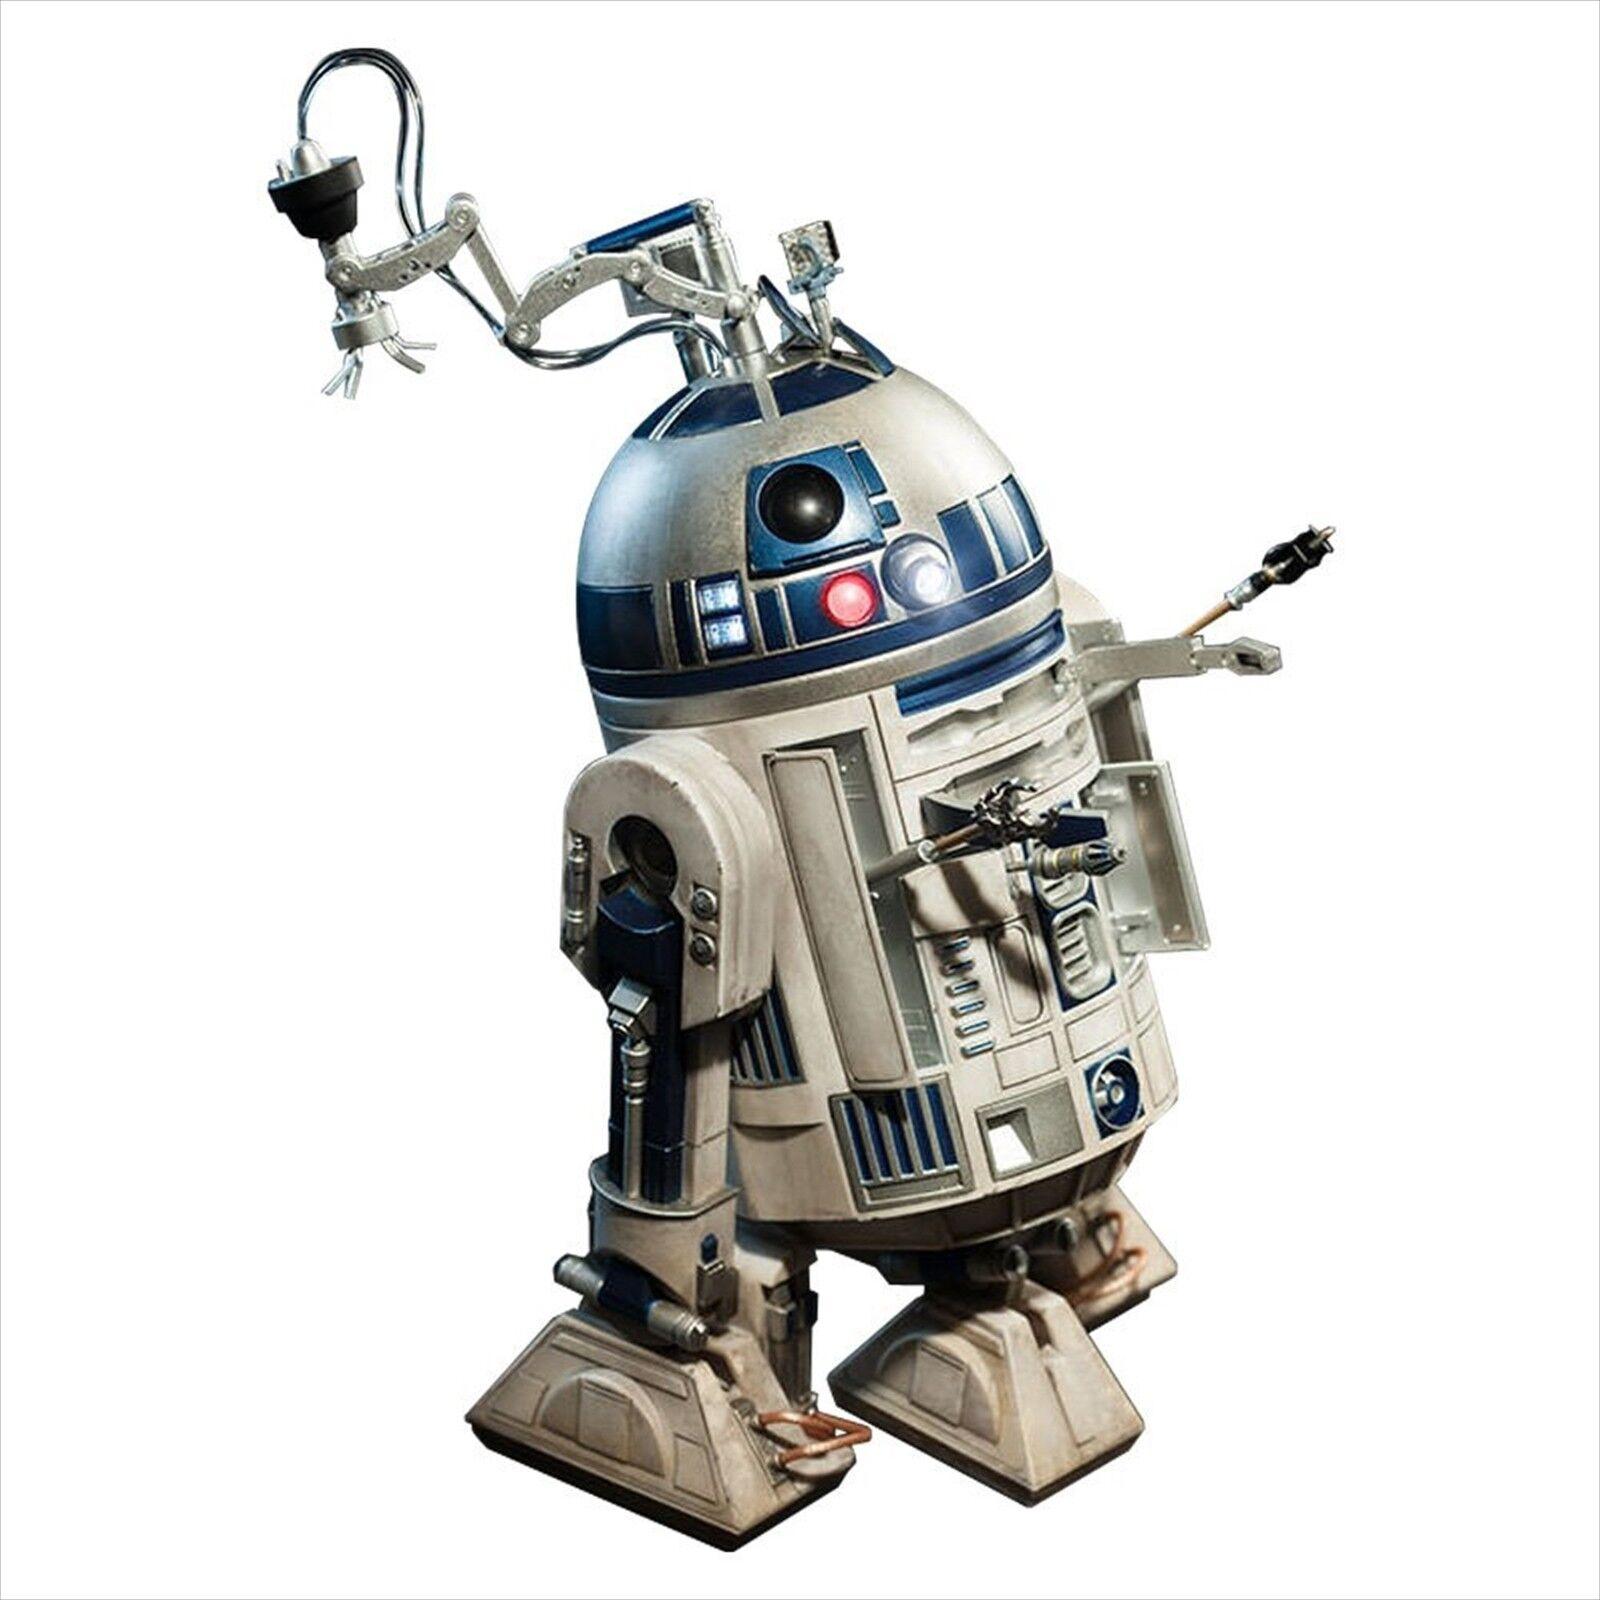 Sideshow Hero Hero Hero of Rebellion Star Wars R2-D2 1/6 Scale Complete Action Figure fc326b